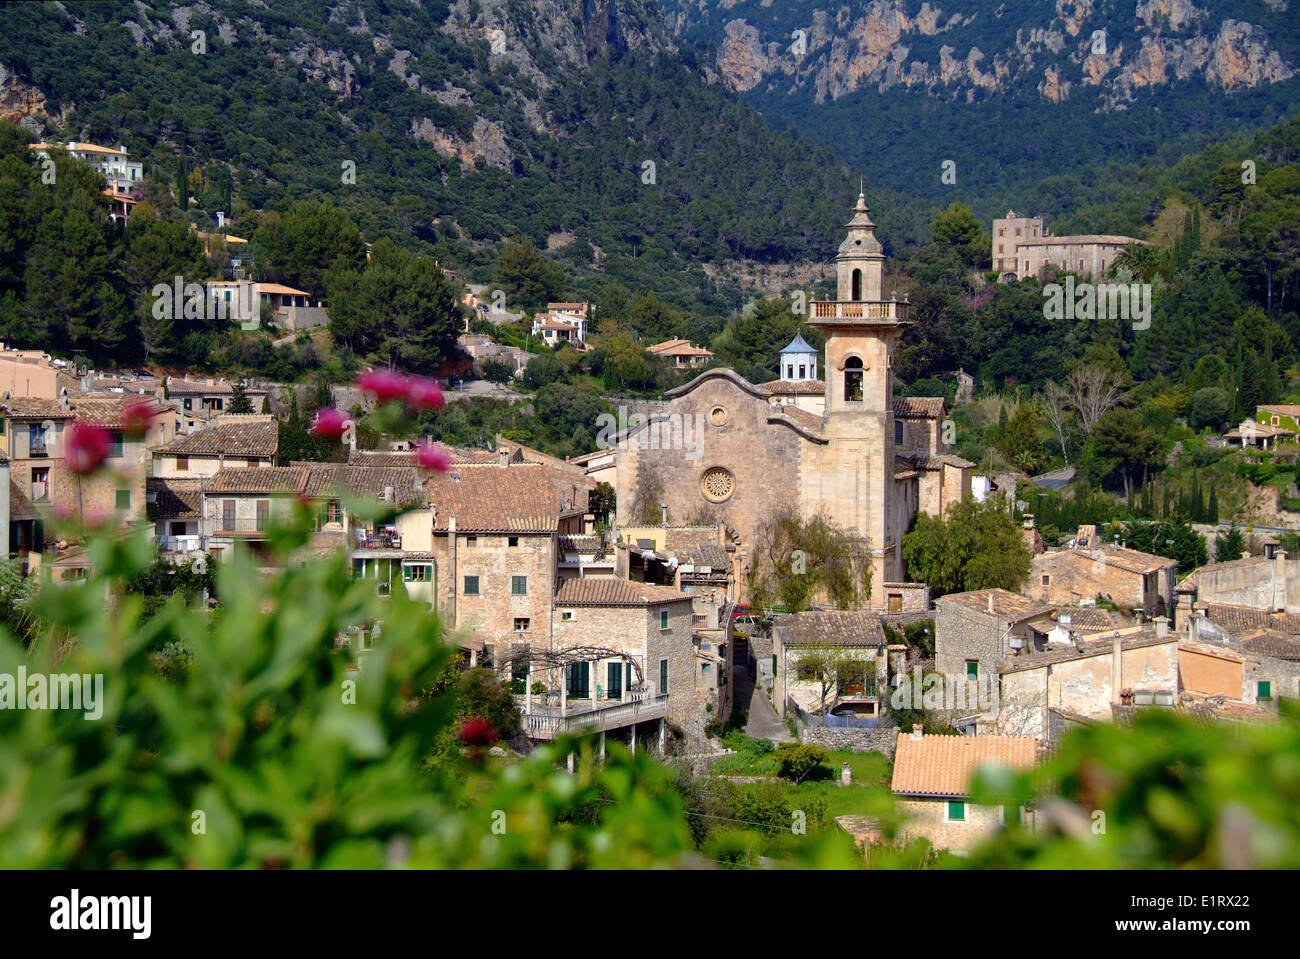 Overview to the village Valldemossa Valdemosa Majorca Spain - Stock Image